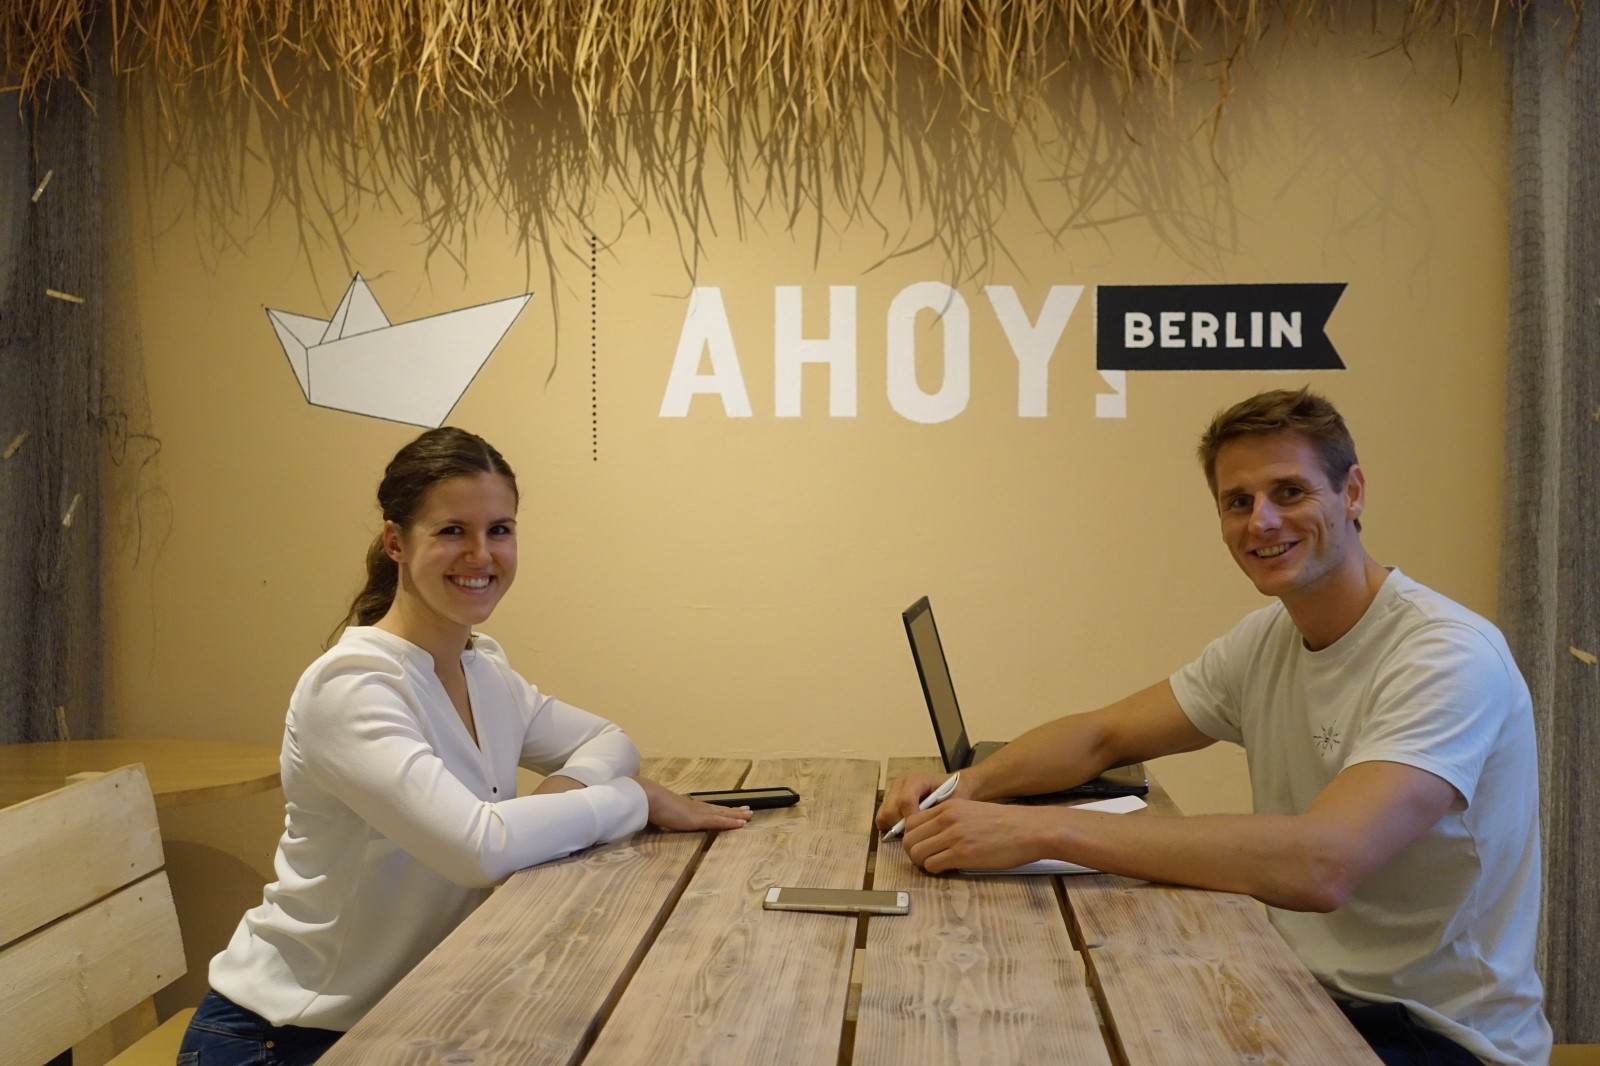 ahoy-berlin-startuptrend-bild-23